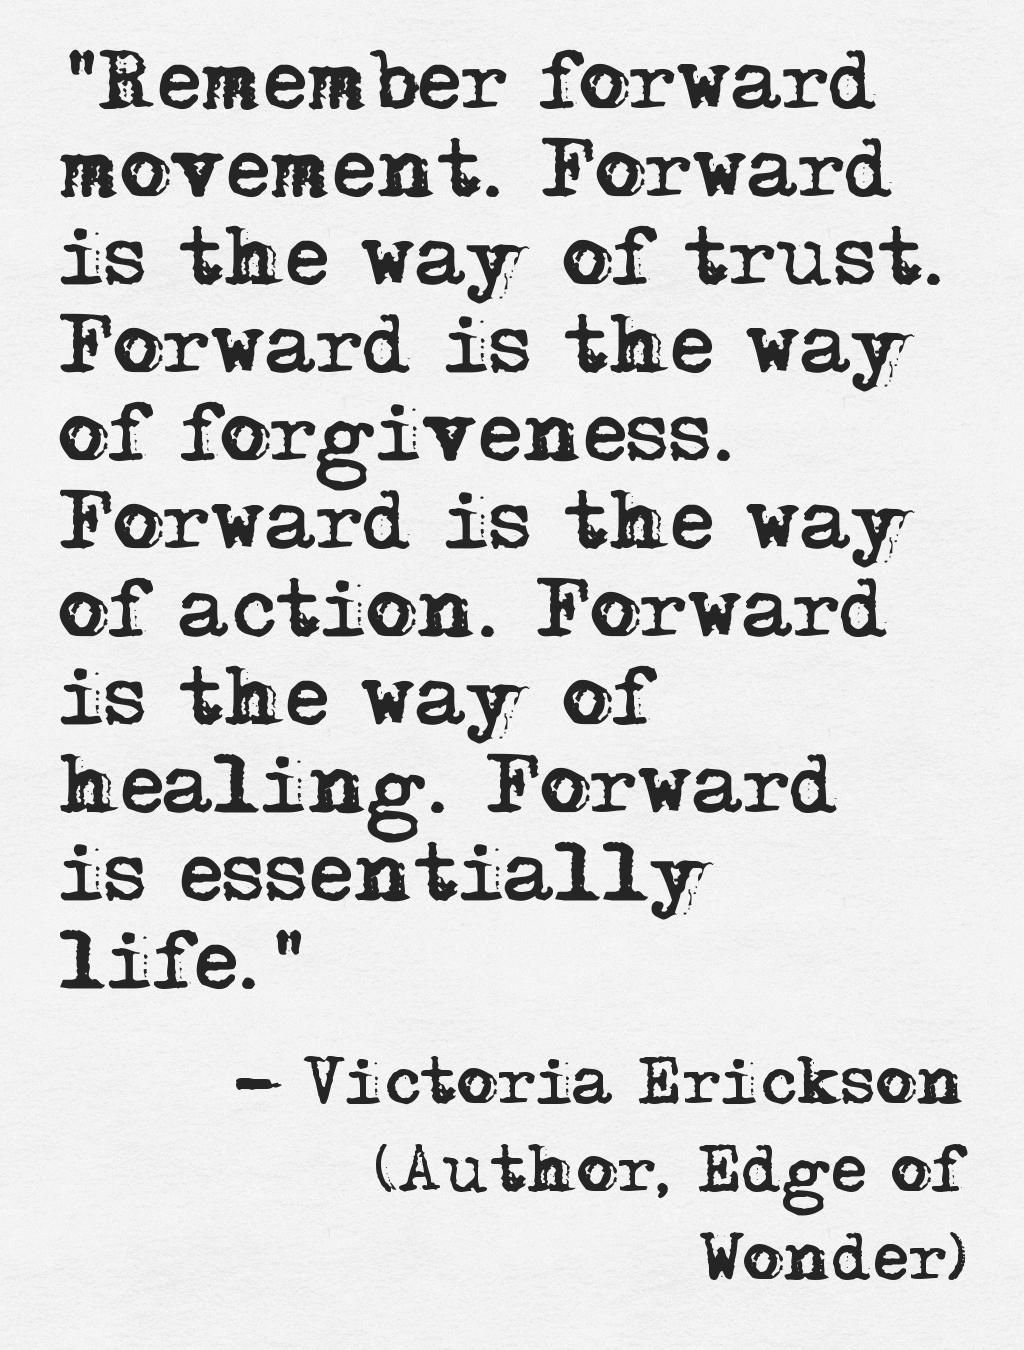 Victoria Erickson (instagram: Victoria1031) (facebook